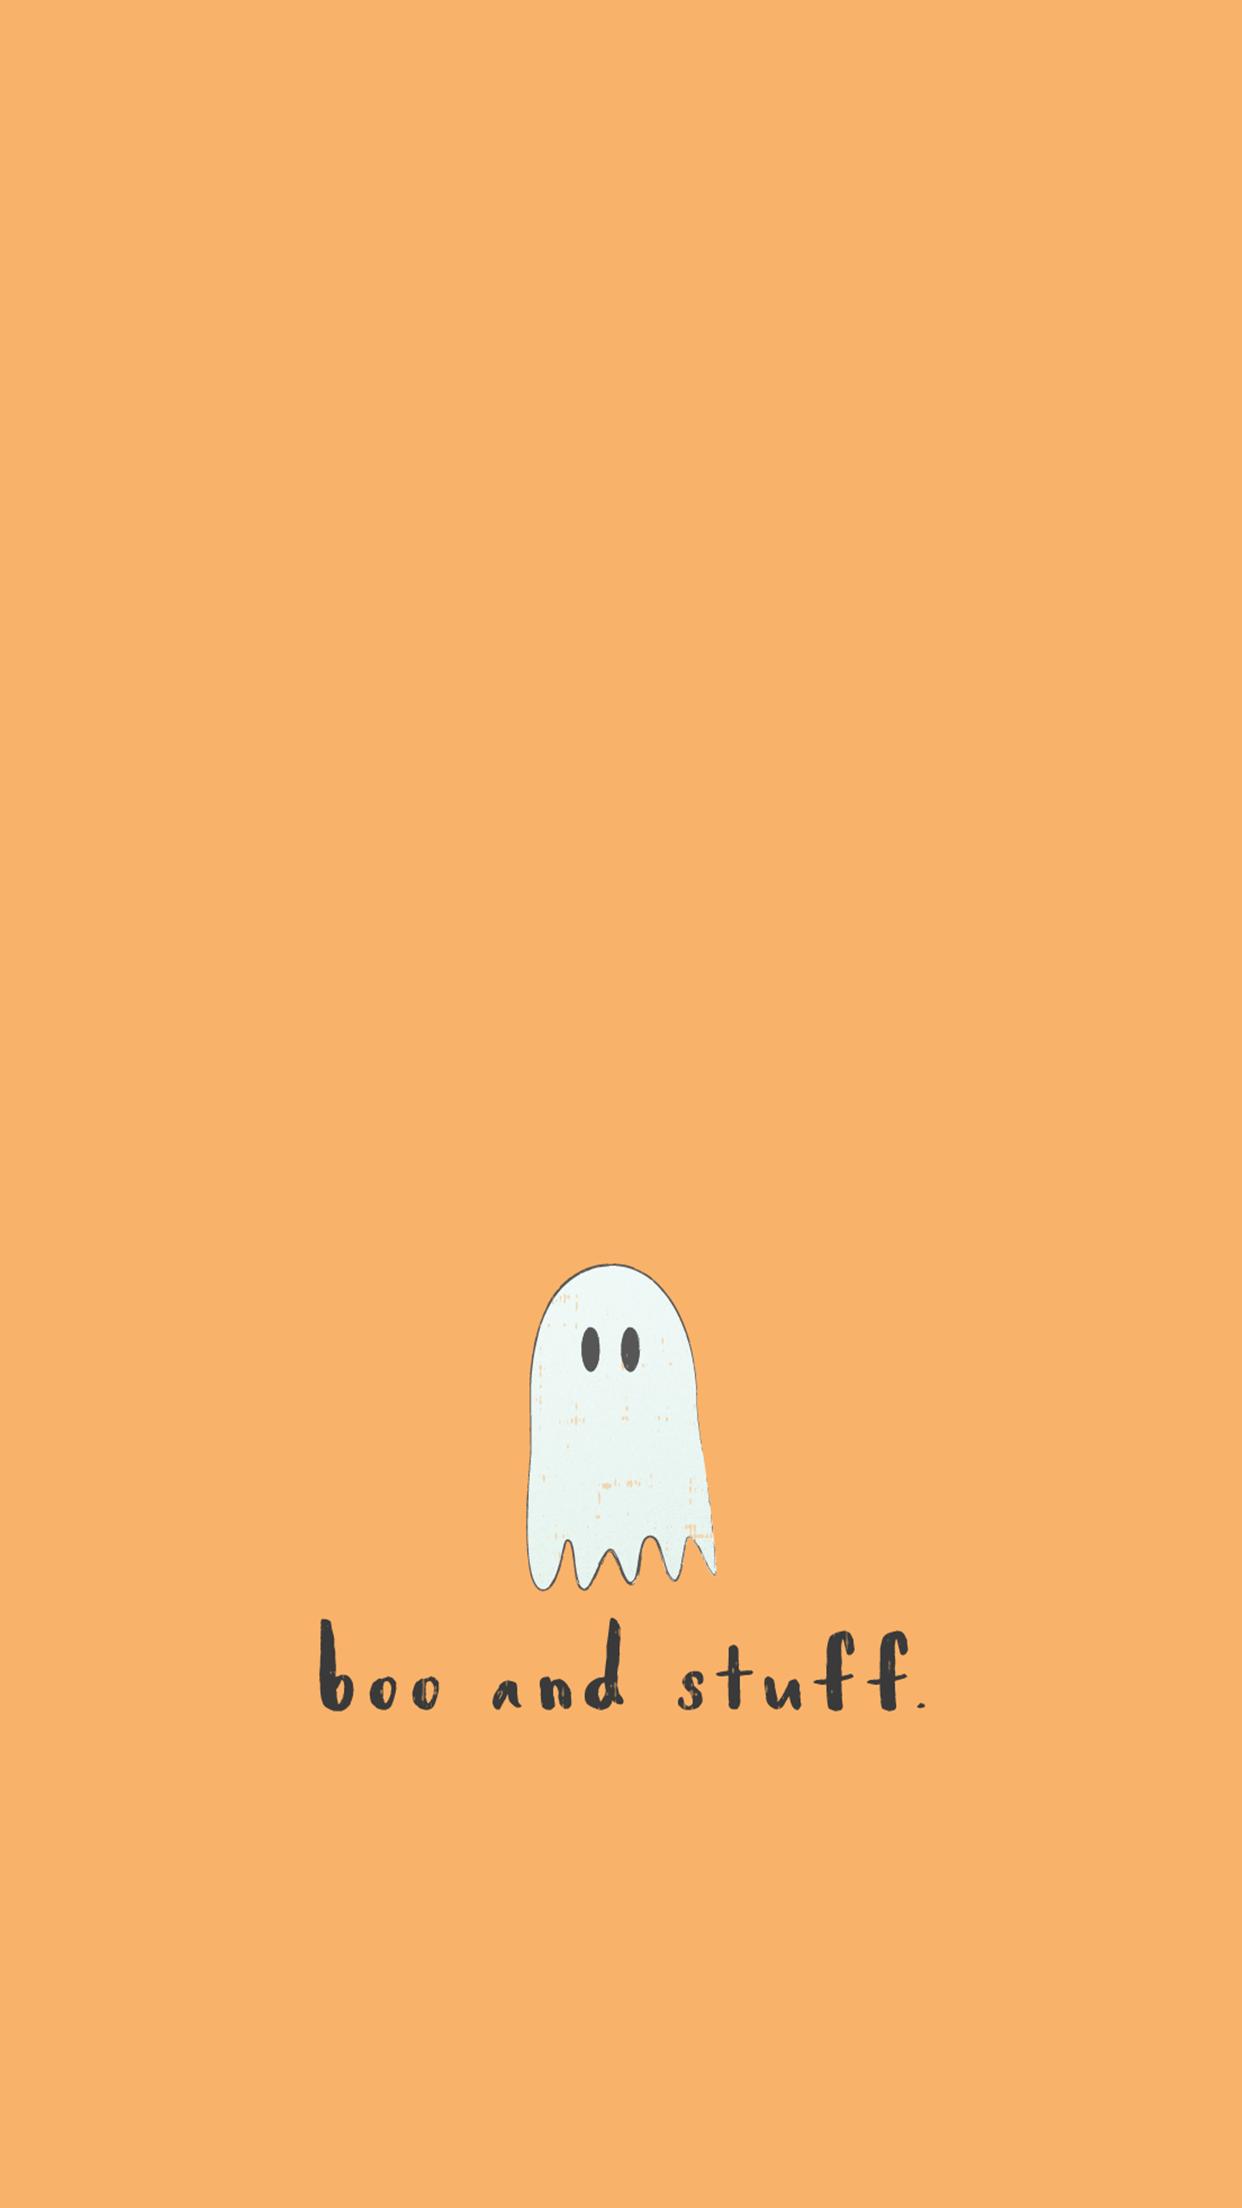 aesthetic Halloween wallpaper design ideas